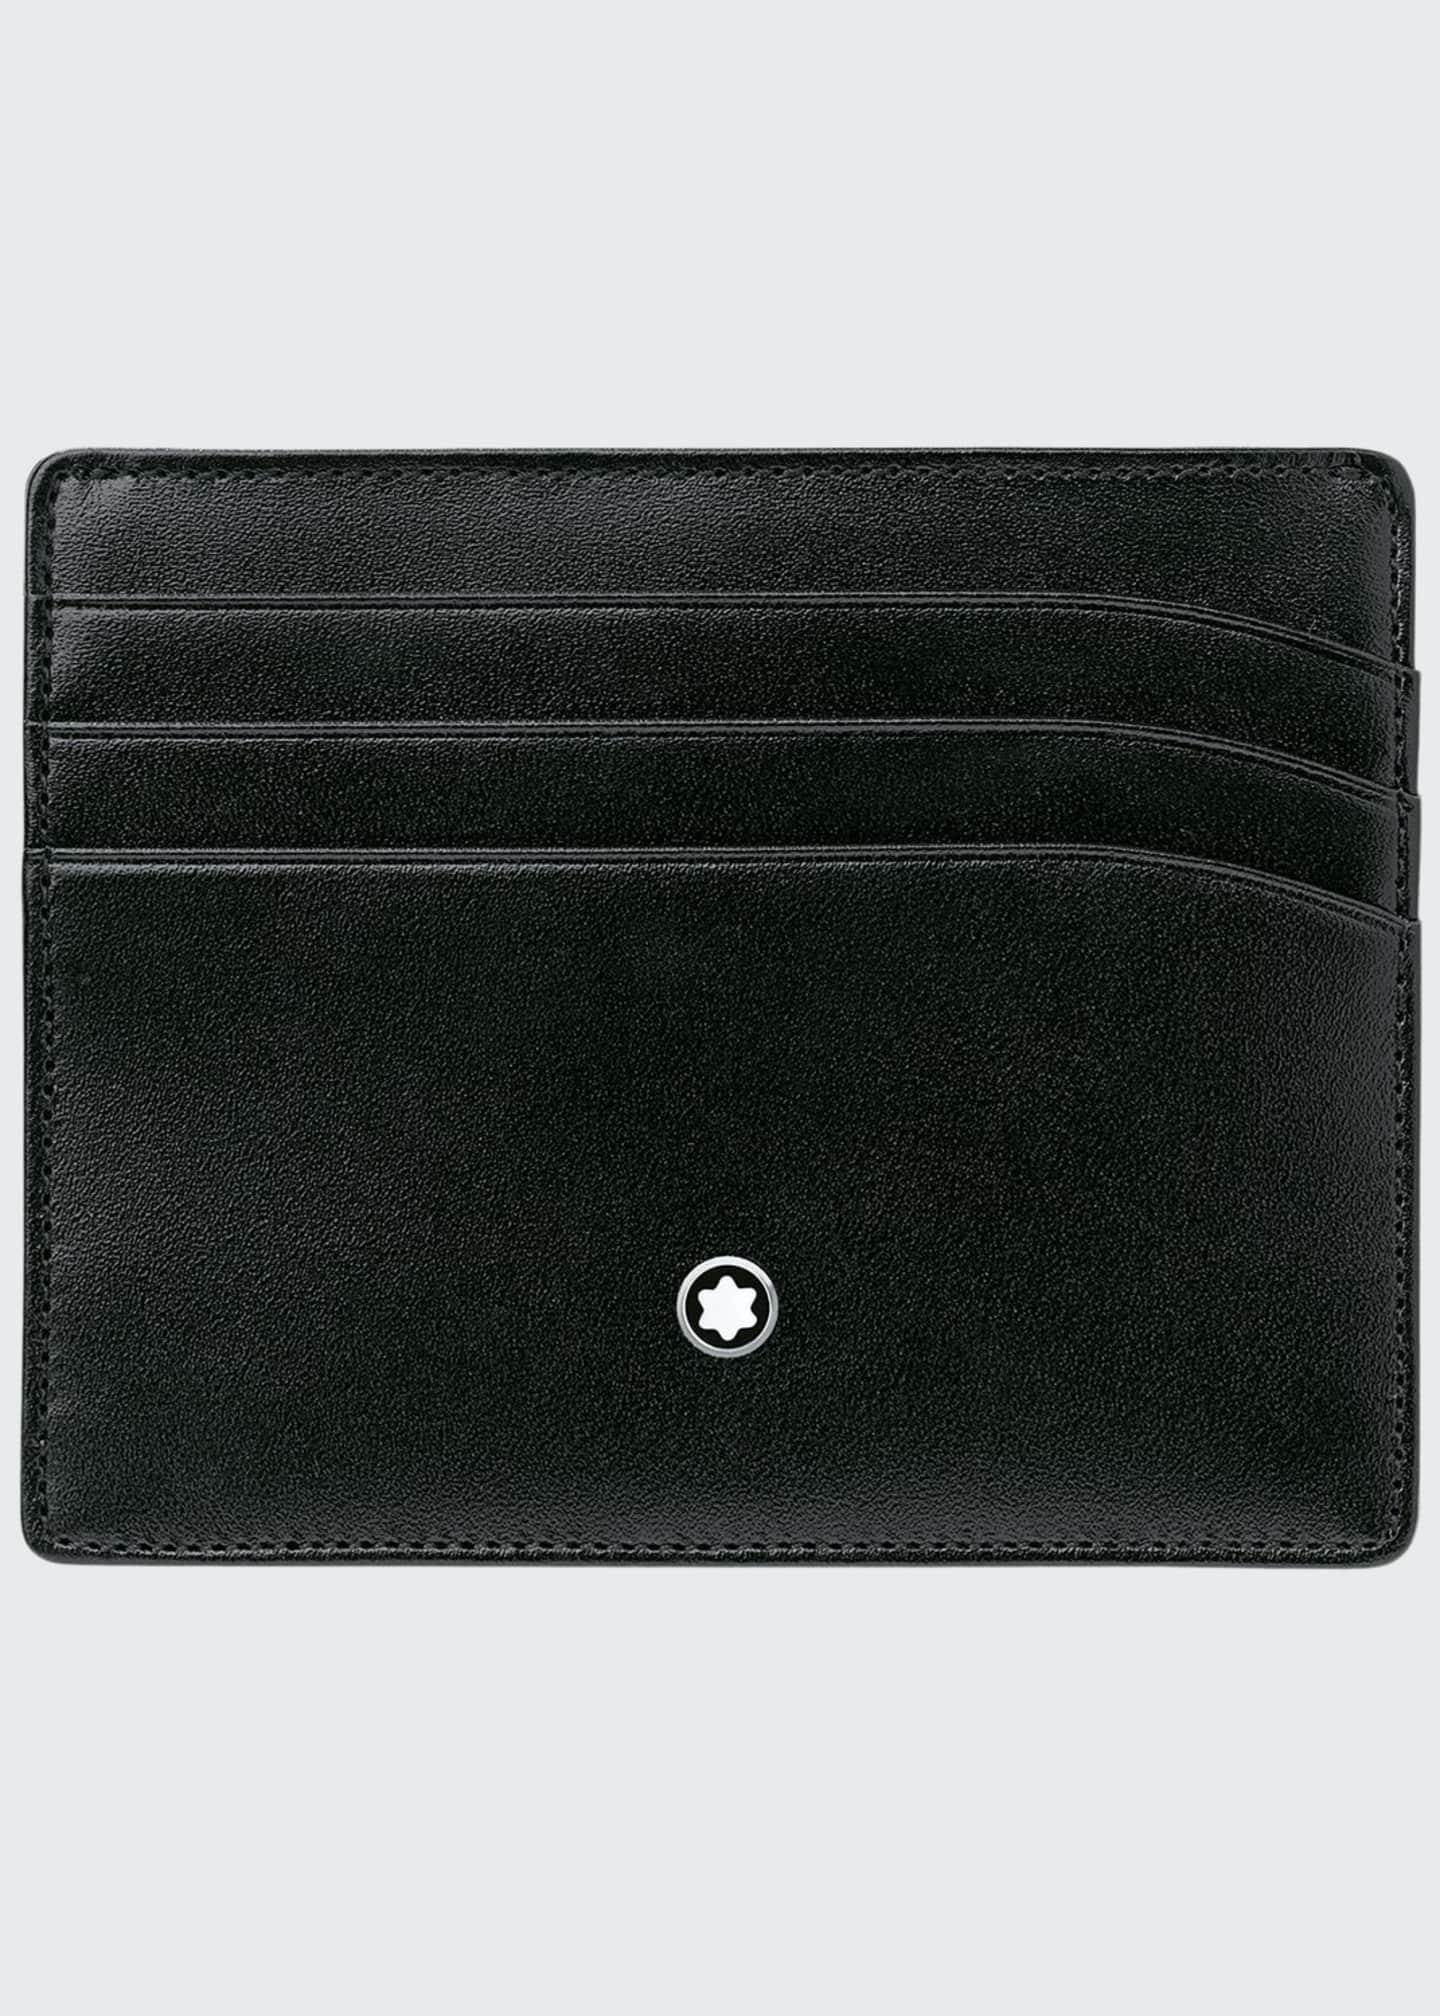 Montblanc Meisterst�ck Pocket Leather Classic Card Holder